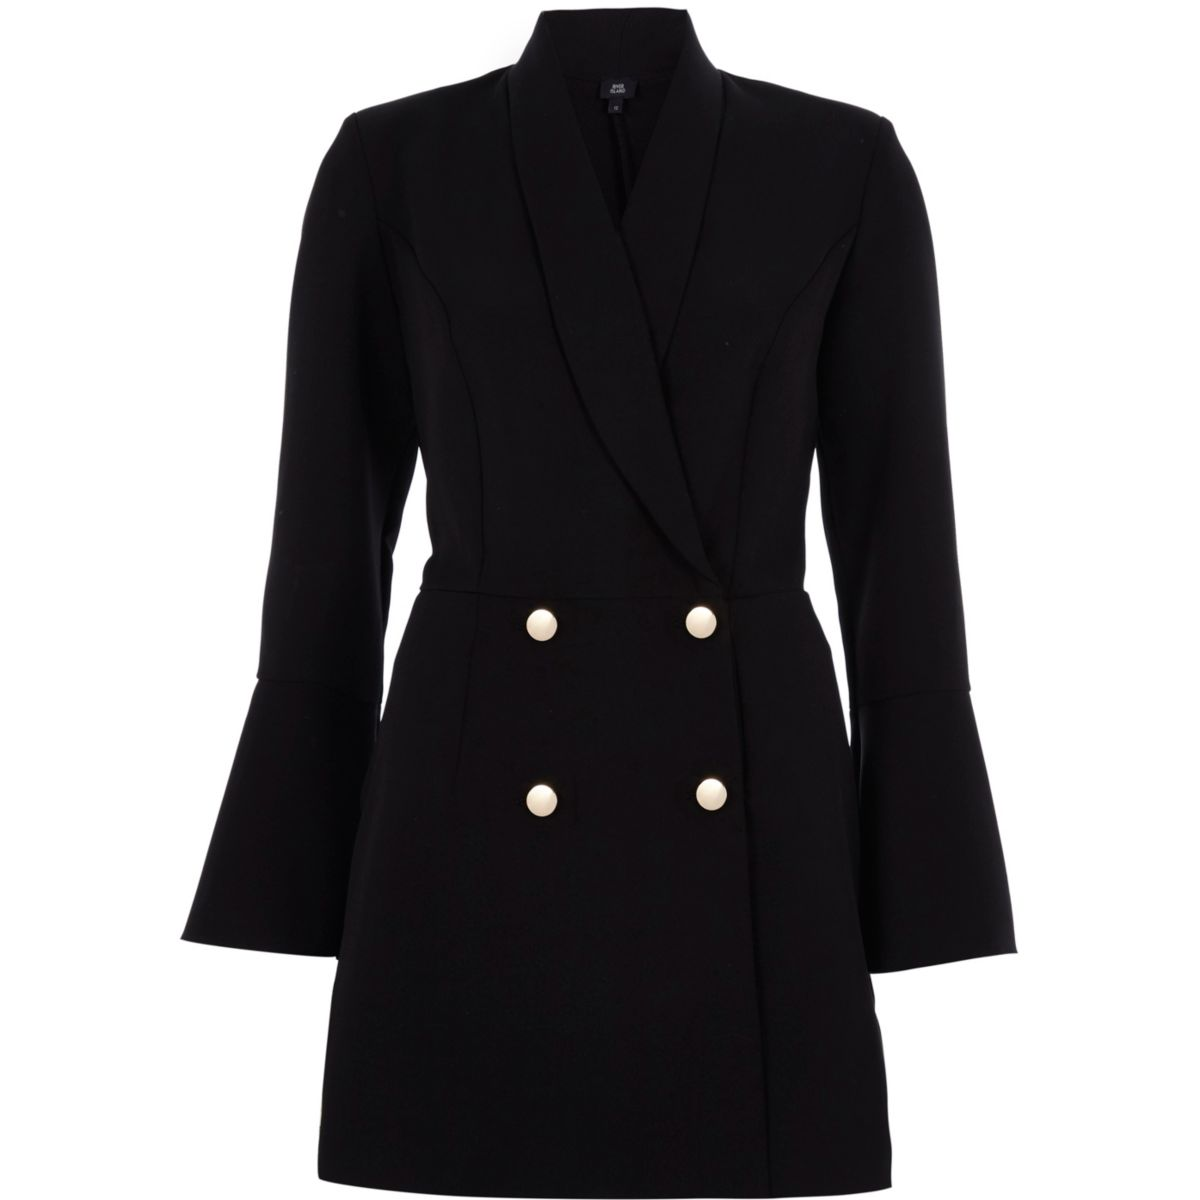 Black bell sleeve tuxedo playsuit